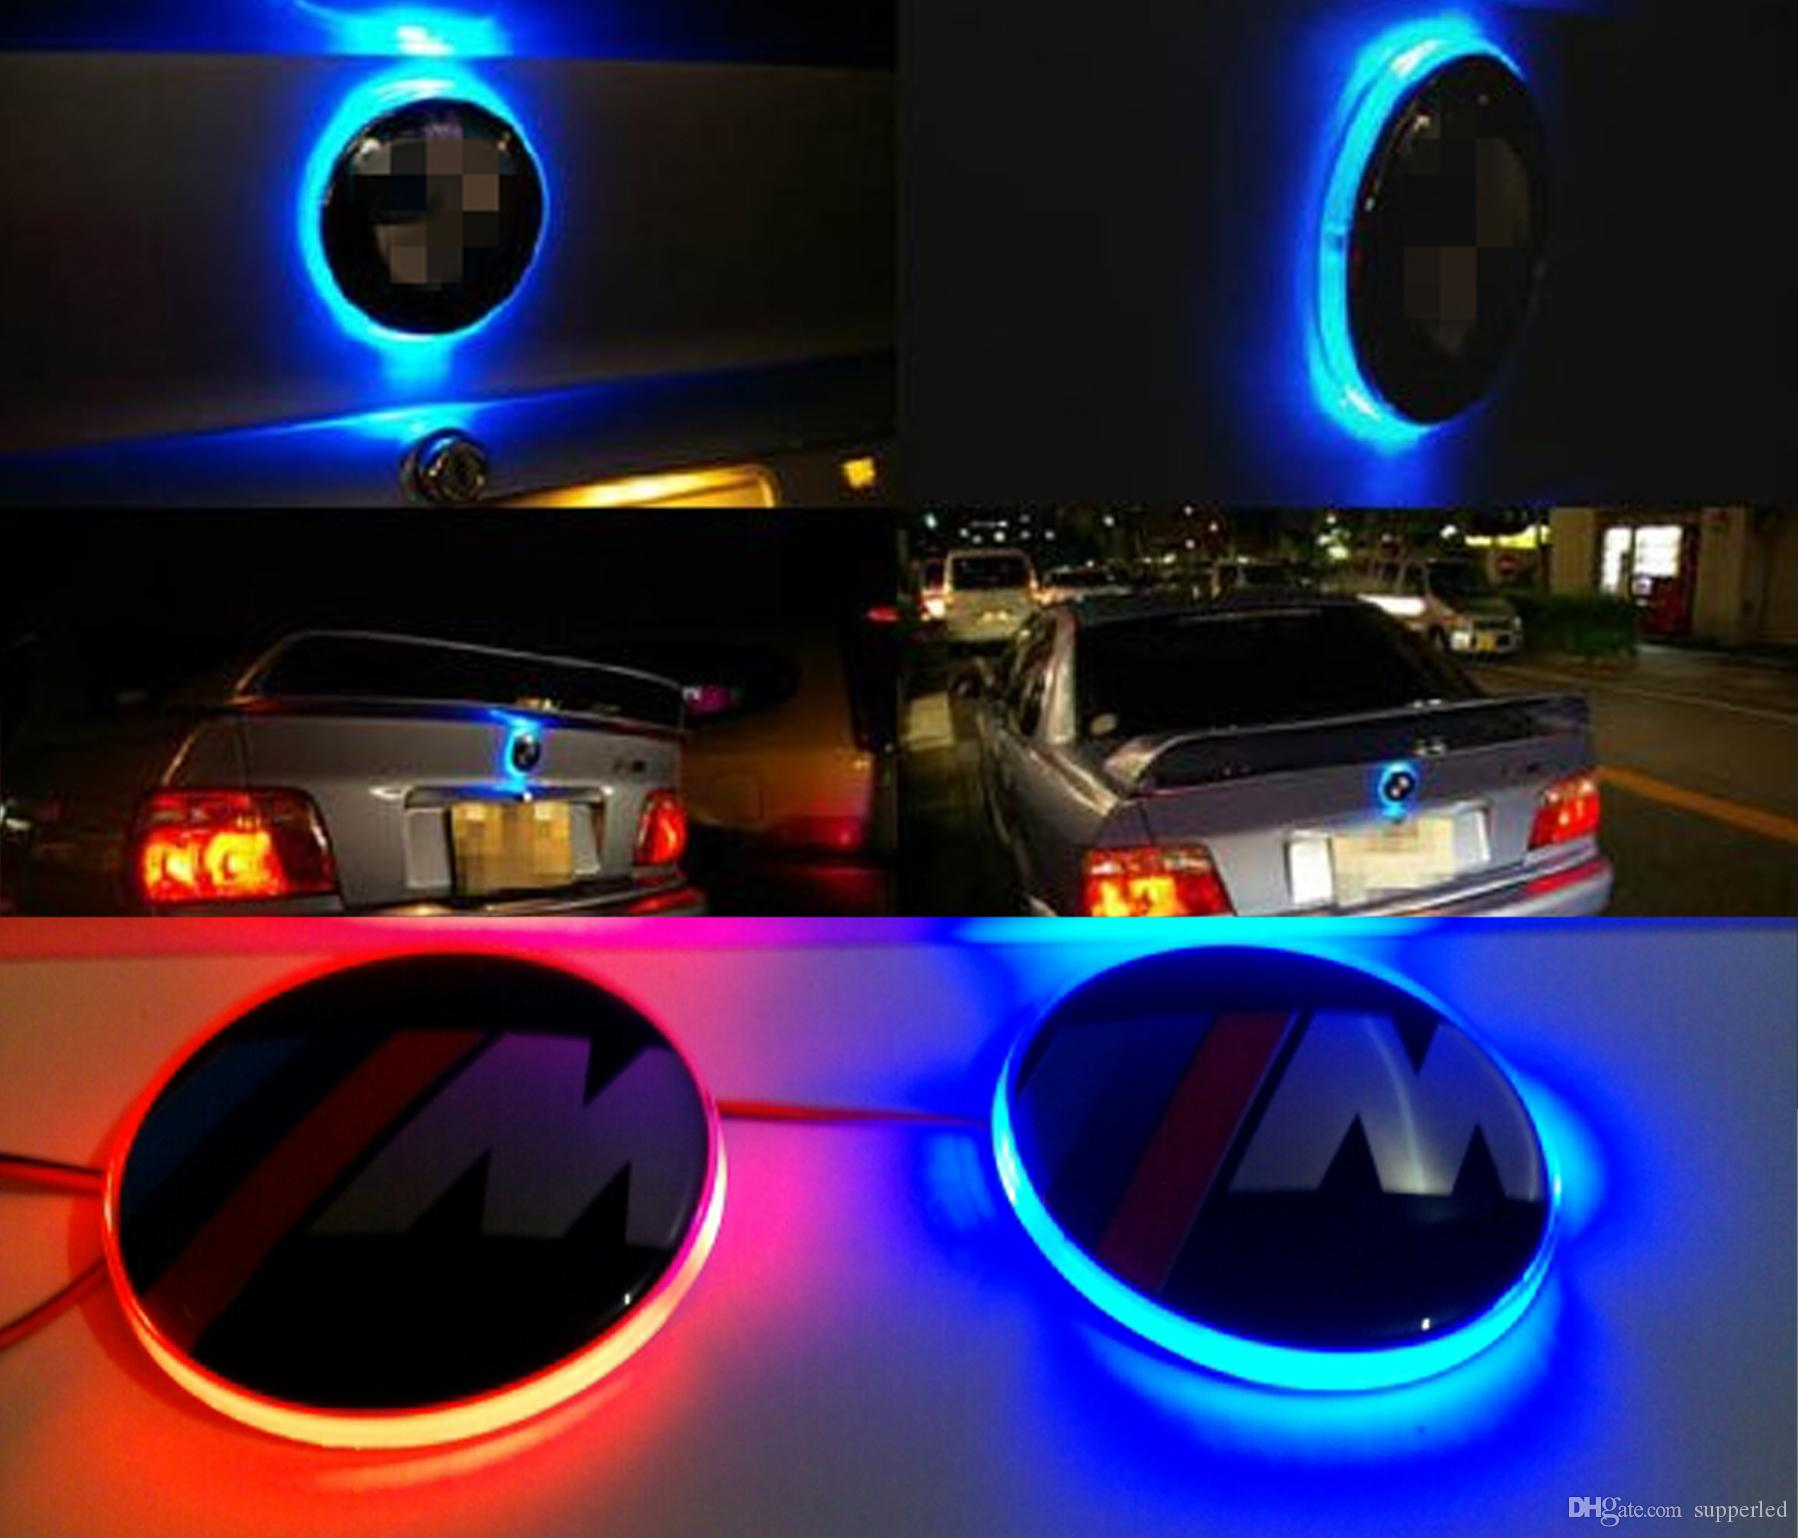 New LED Car Decal Sticker Logo Badge Emblem Light Lamp 12V For BMW 3 5 7 Series Red White Blue Color Hot Selling